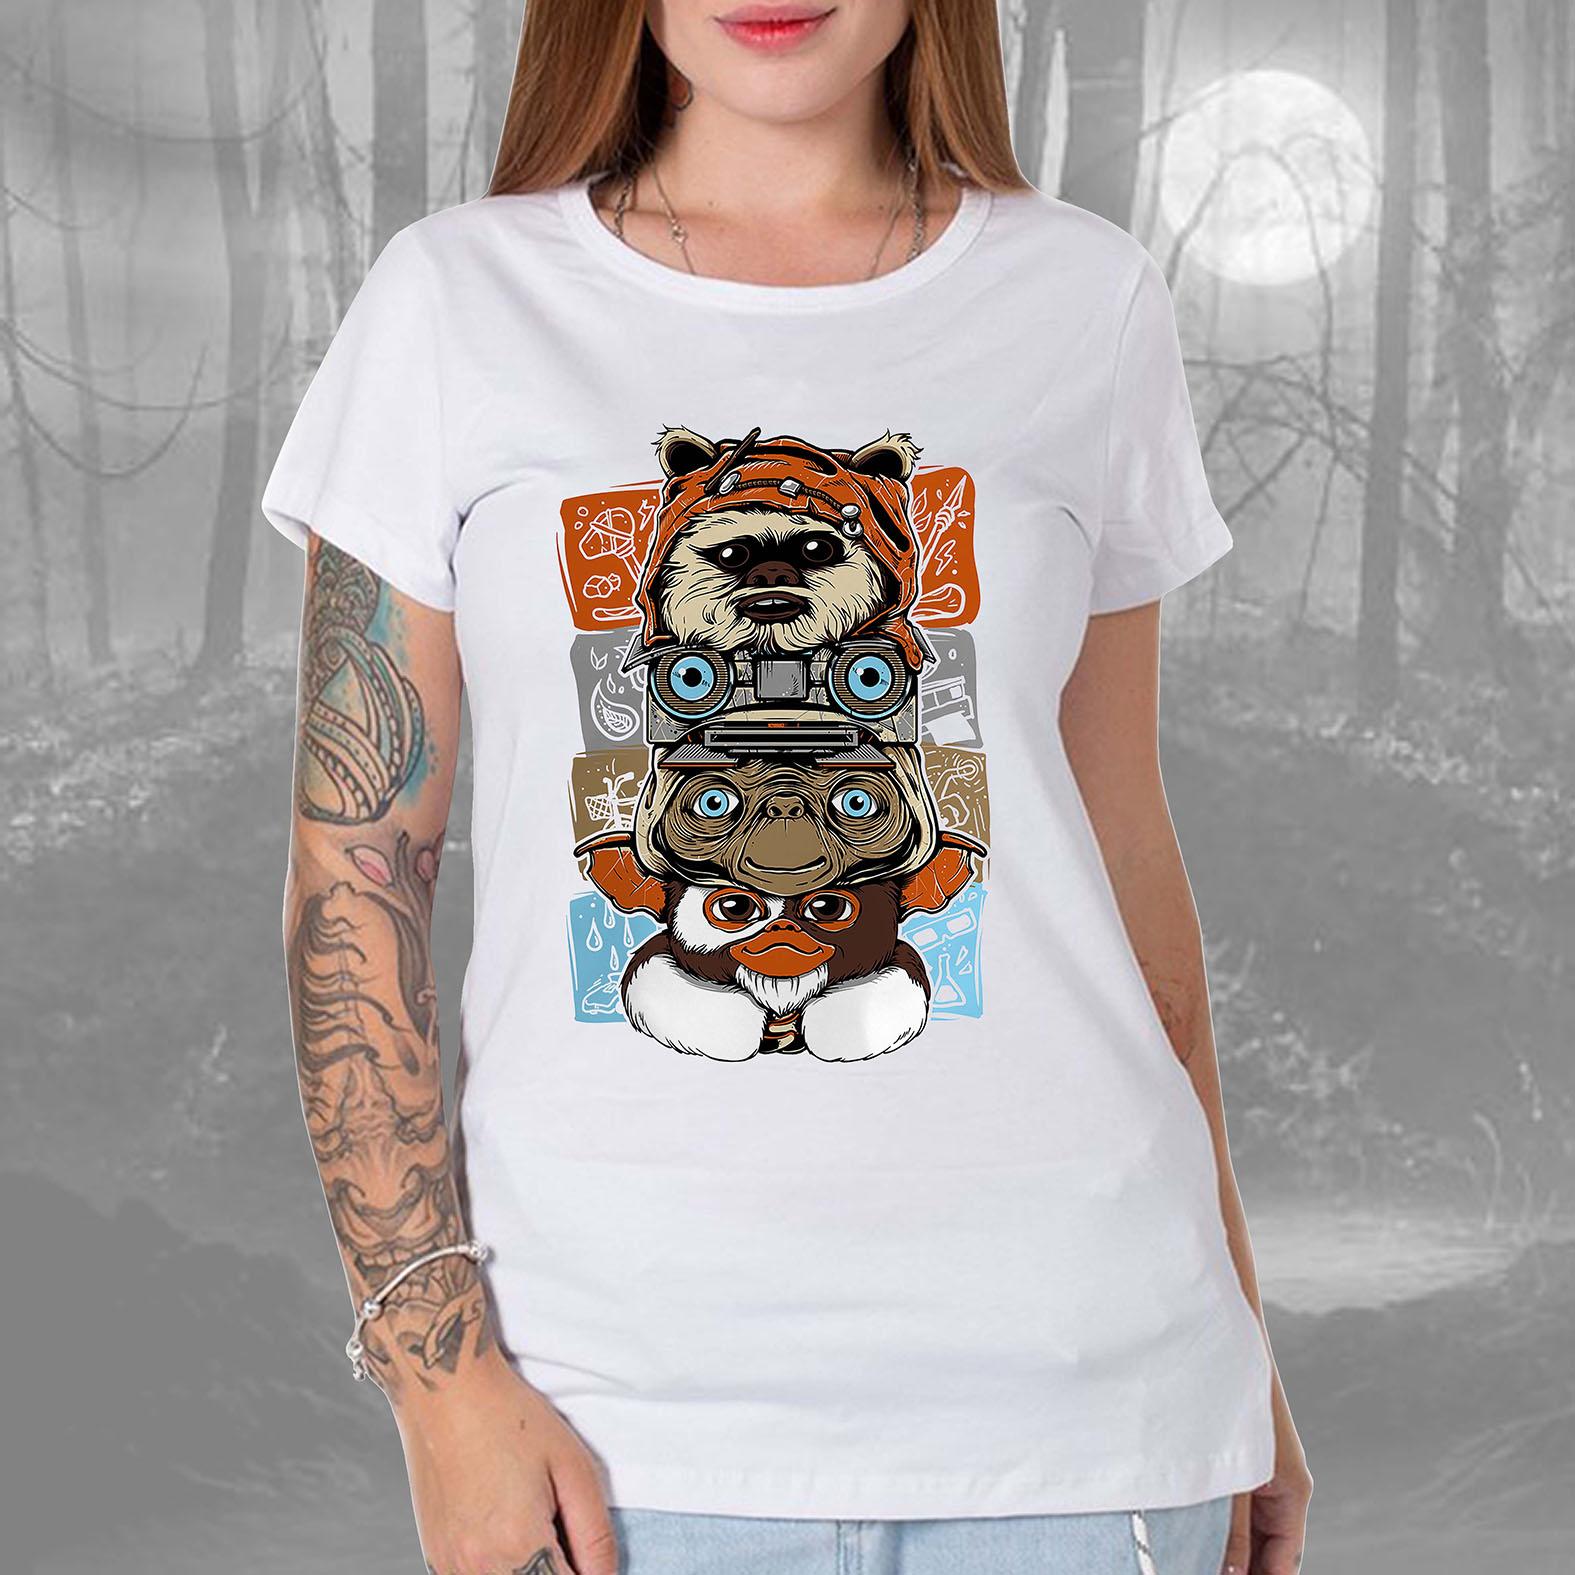 Camiseta Feminina Unissex Ewoks Johnny Five Et Extraterrestre Mogwai Gremlins Monsters Anos 80s Horror (Branca) - EV